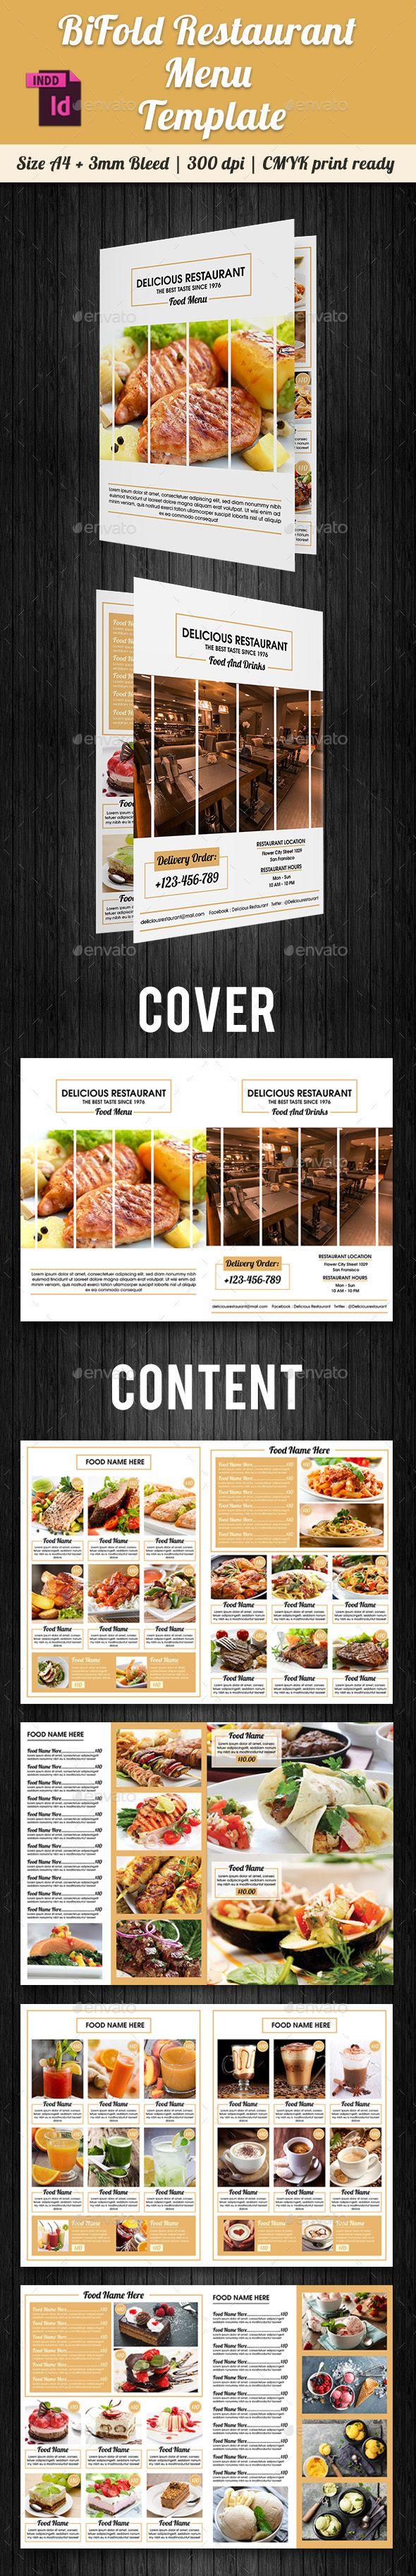 BiFold Restaurant Menu Template InDesign INDD